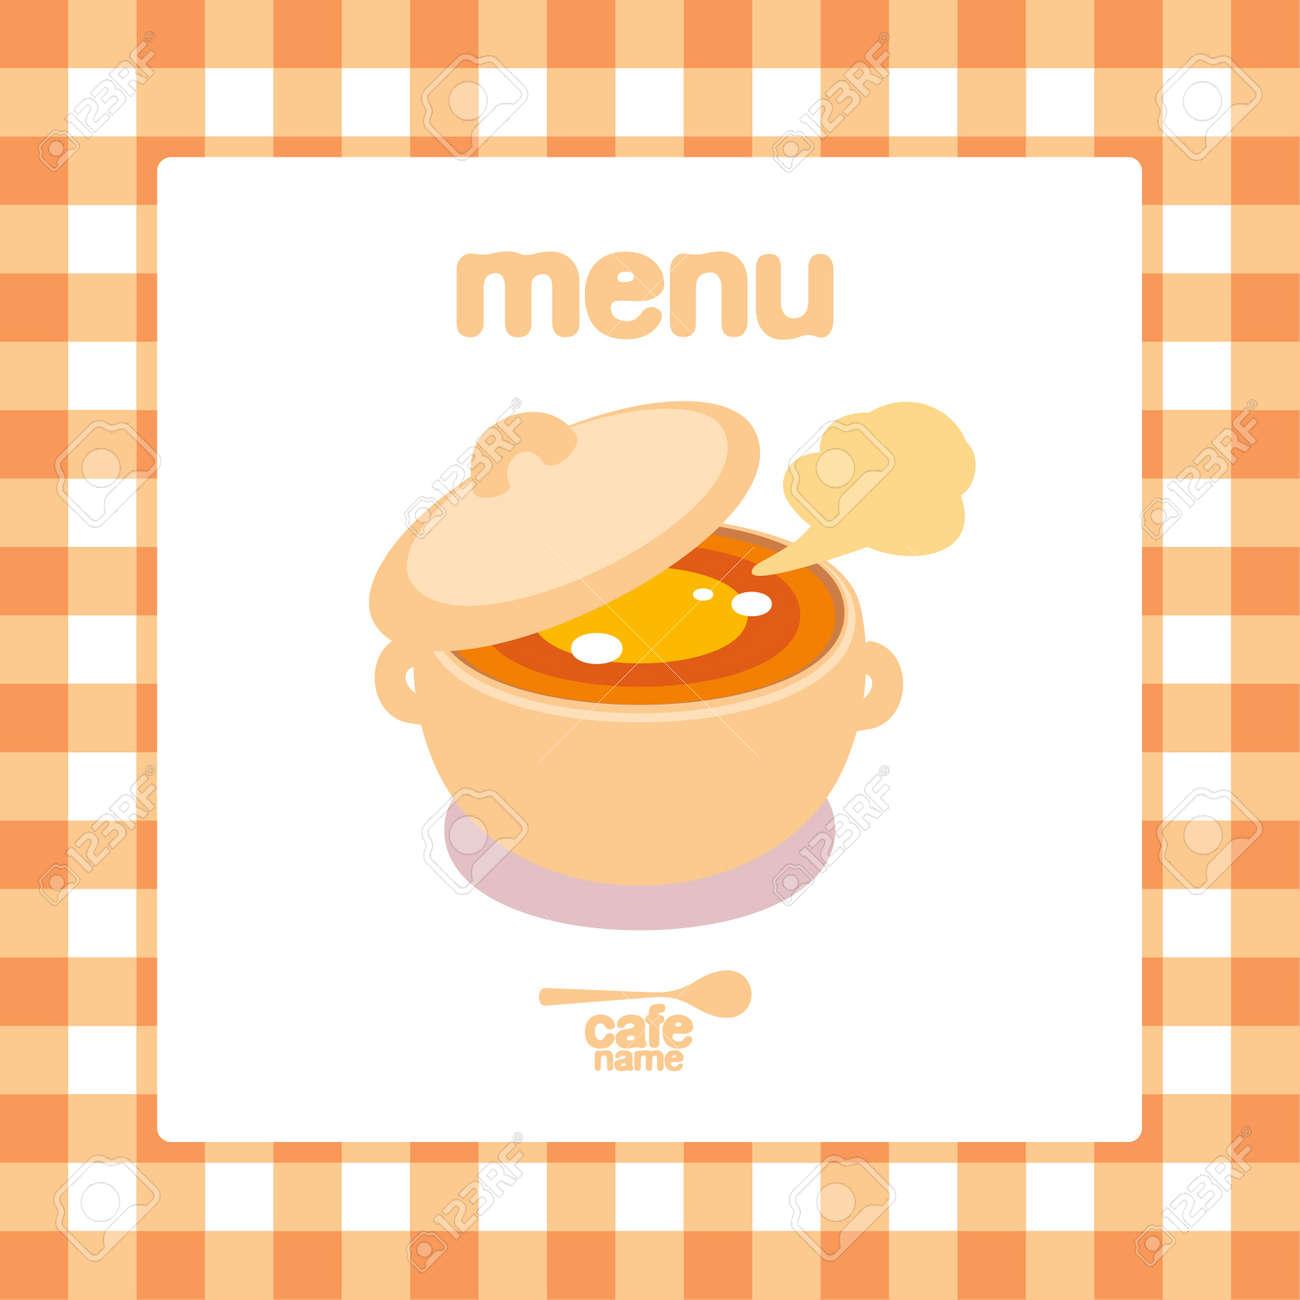 Home Cooking Menu Card Design template  Stock Vector   15713834Home Cooking Menu Card Design Template  Royalty Free Cliparts  . Home Design Card. Home Design Ideas